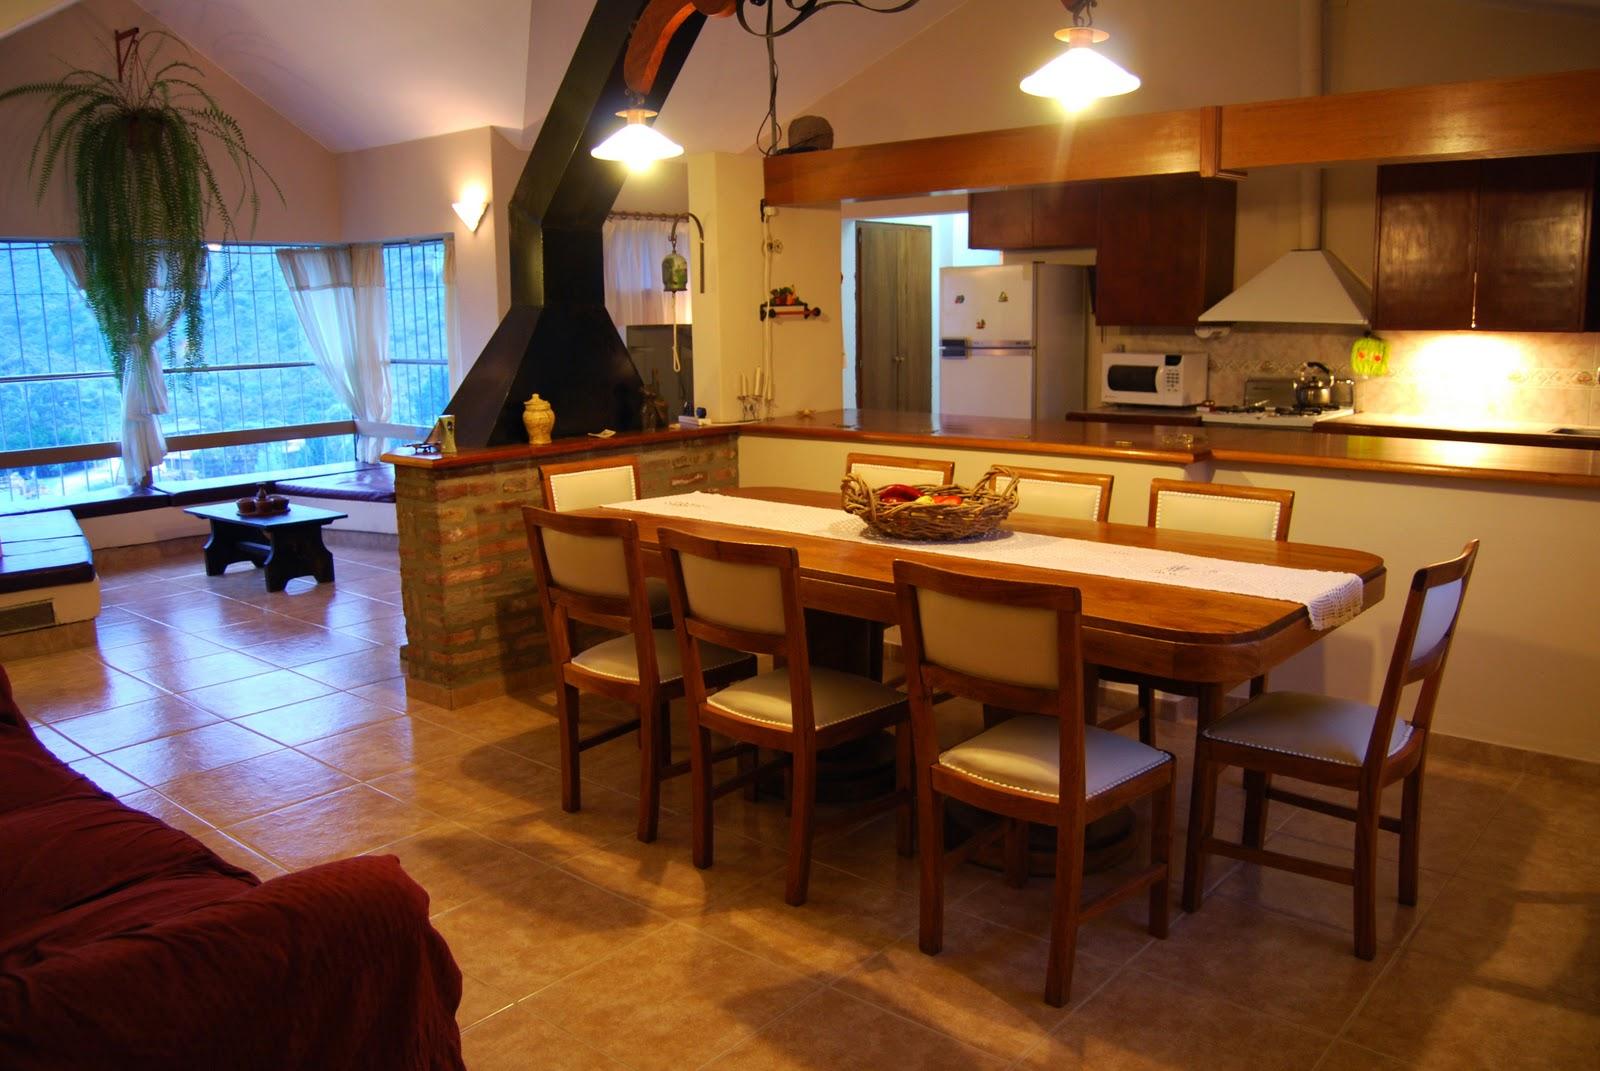 Cuesta blanca living cocina comedor con hogar for Cocina de comedor